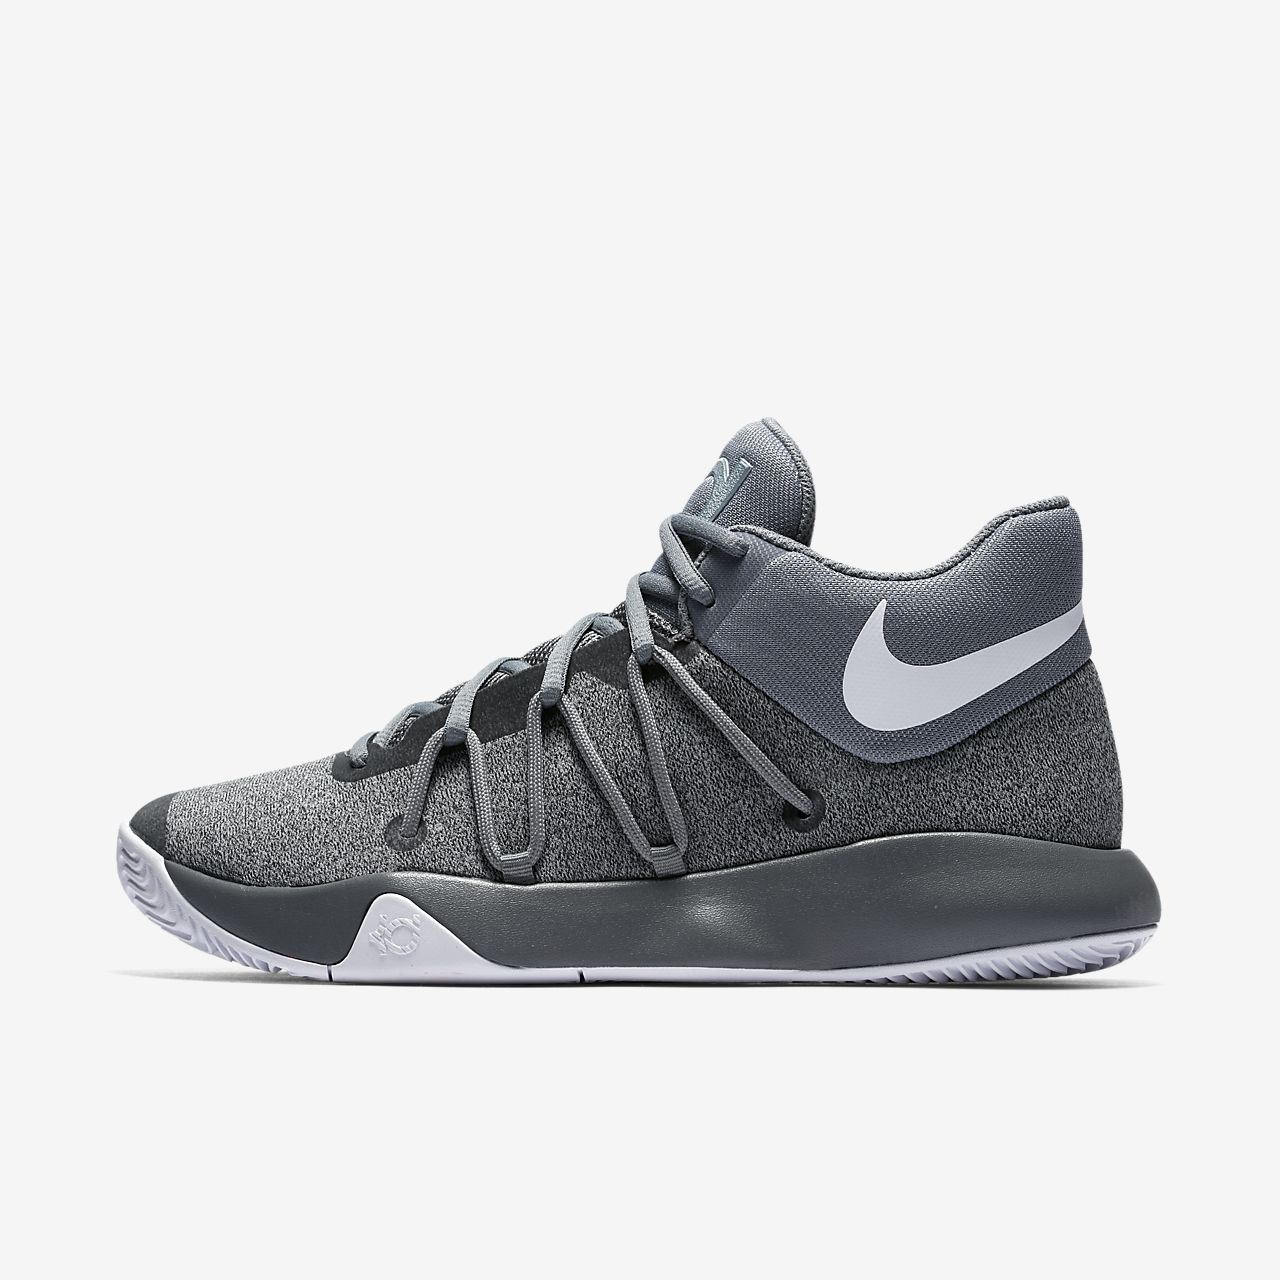 ... kd trey 5 v mens basketball shoe